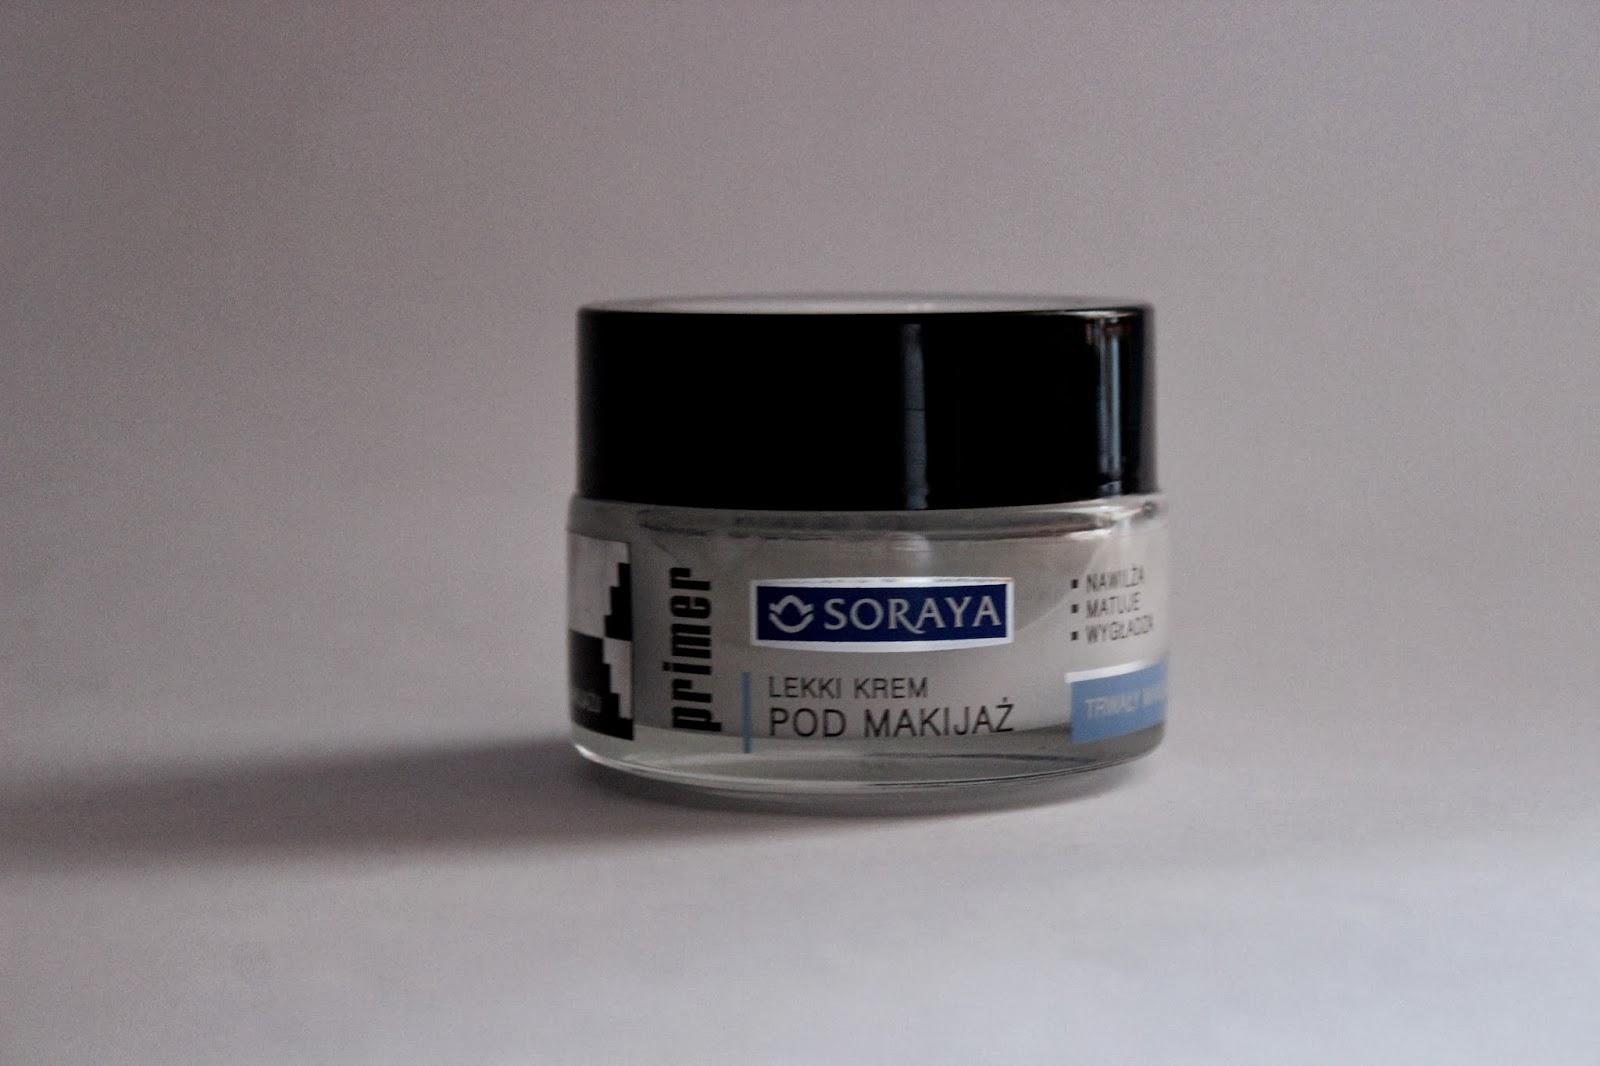 Lekki krem pod makijaż - SORAYA